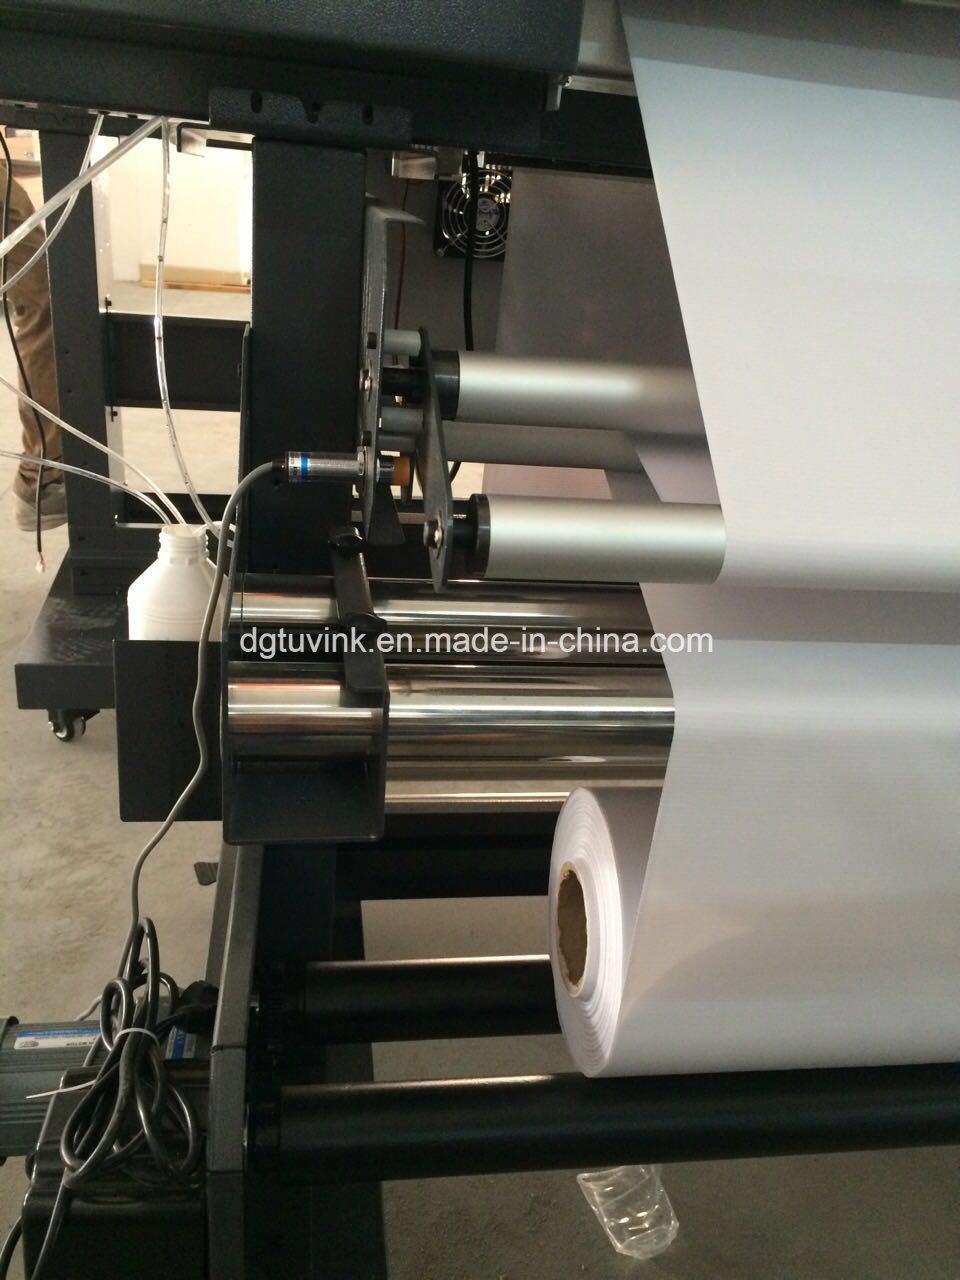 87inch 1440dpi Dual Printhead LED Curable UV Printer